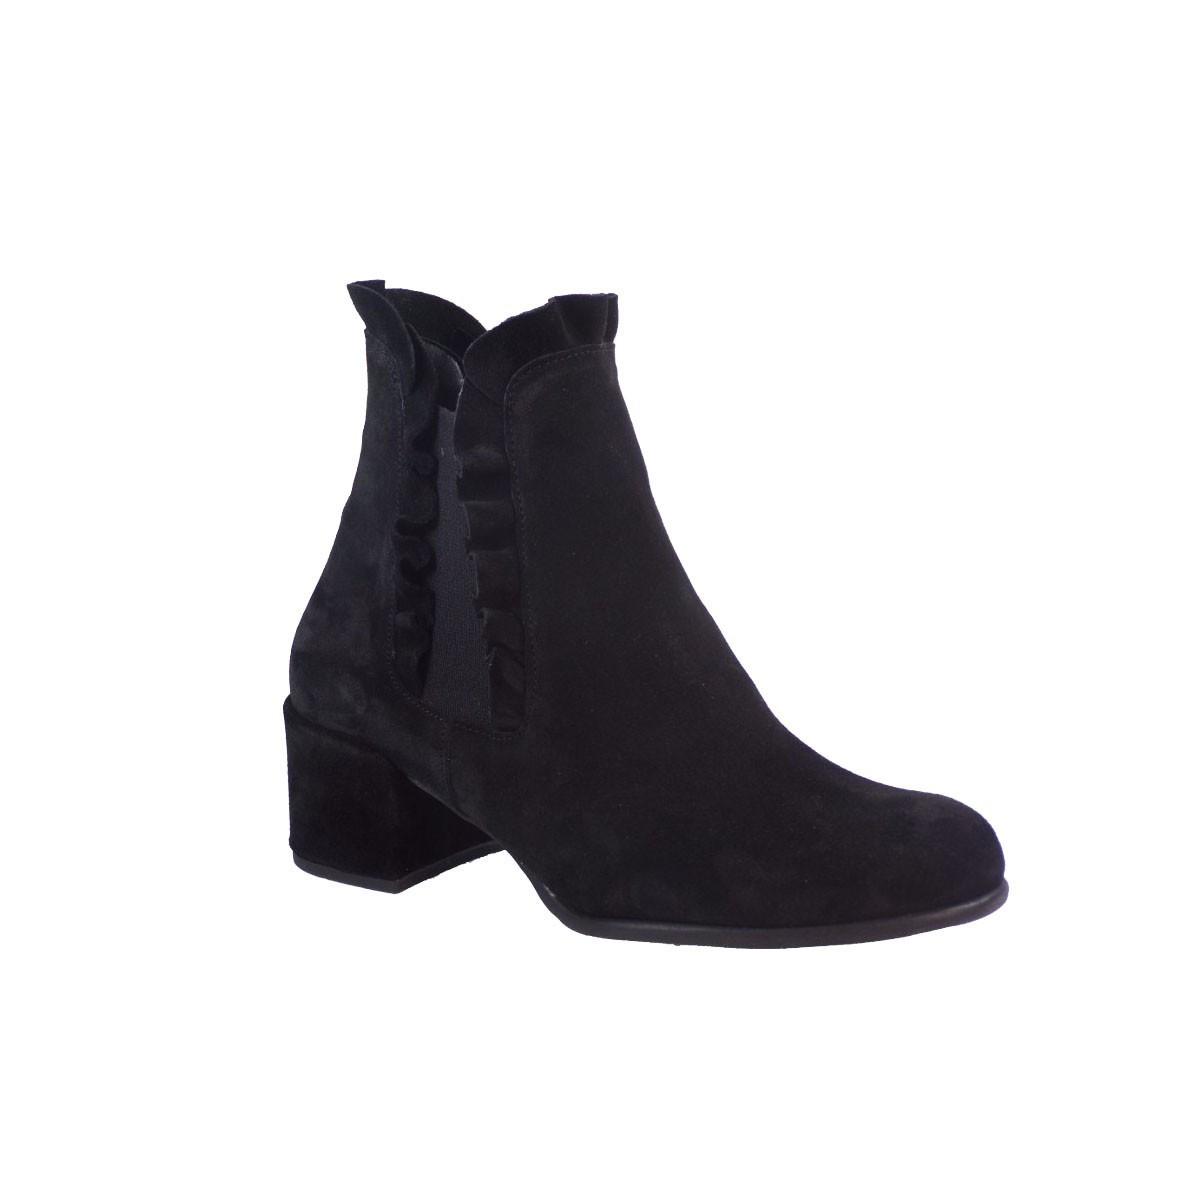 SMART CRONOS Γυναικεία Παπούτσια Mποτάκια 6679/3602 Μαύρο Δέρμα Καστόρι